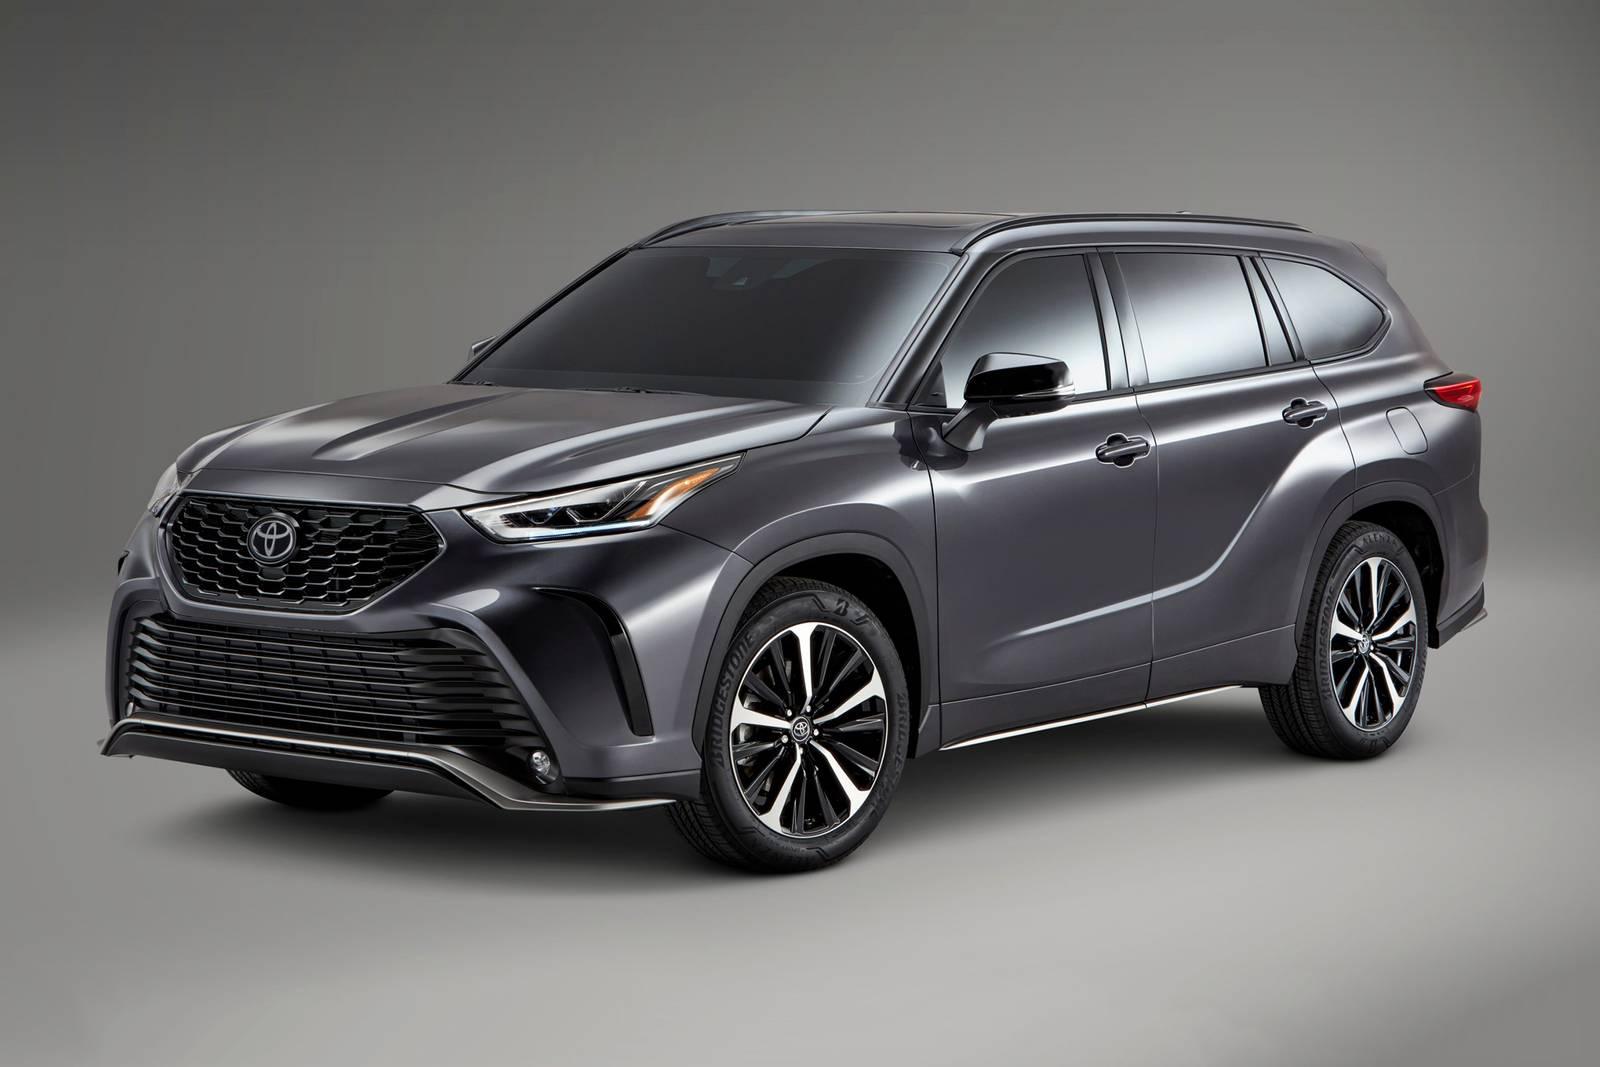 2021 Toyota Highlander Review